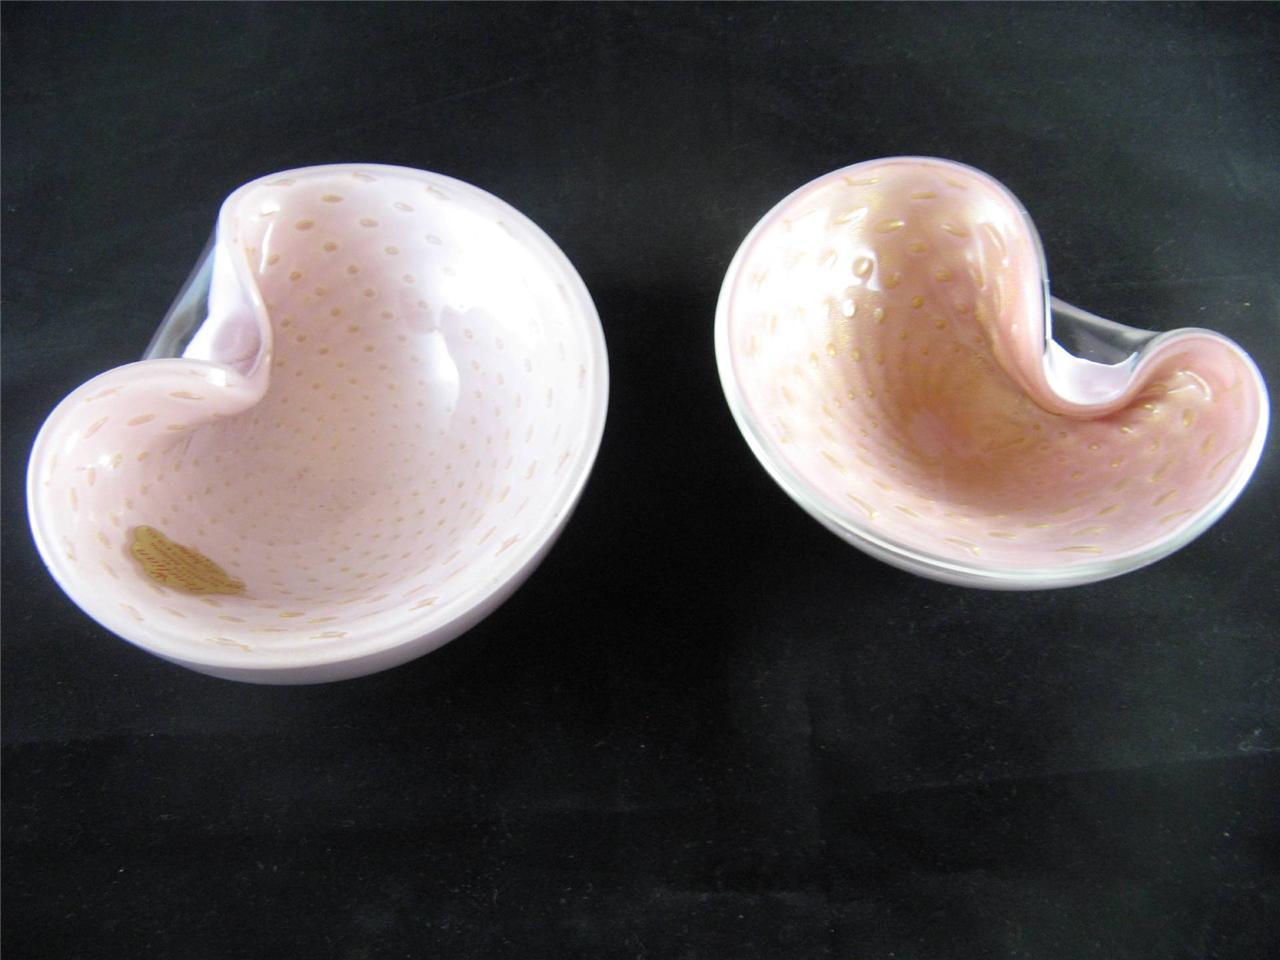 SET-PAIR-OF-MID-CENTURY-MODERN-ITALIAN-BARBINI-MURANO-ART-GLASS-BOWLS